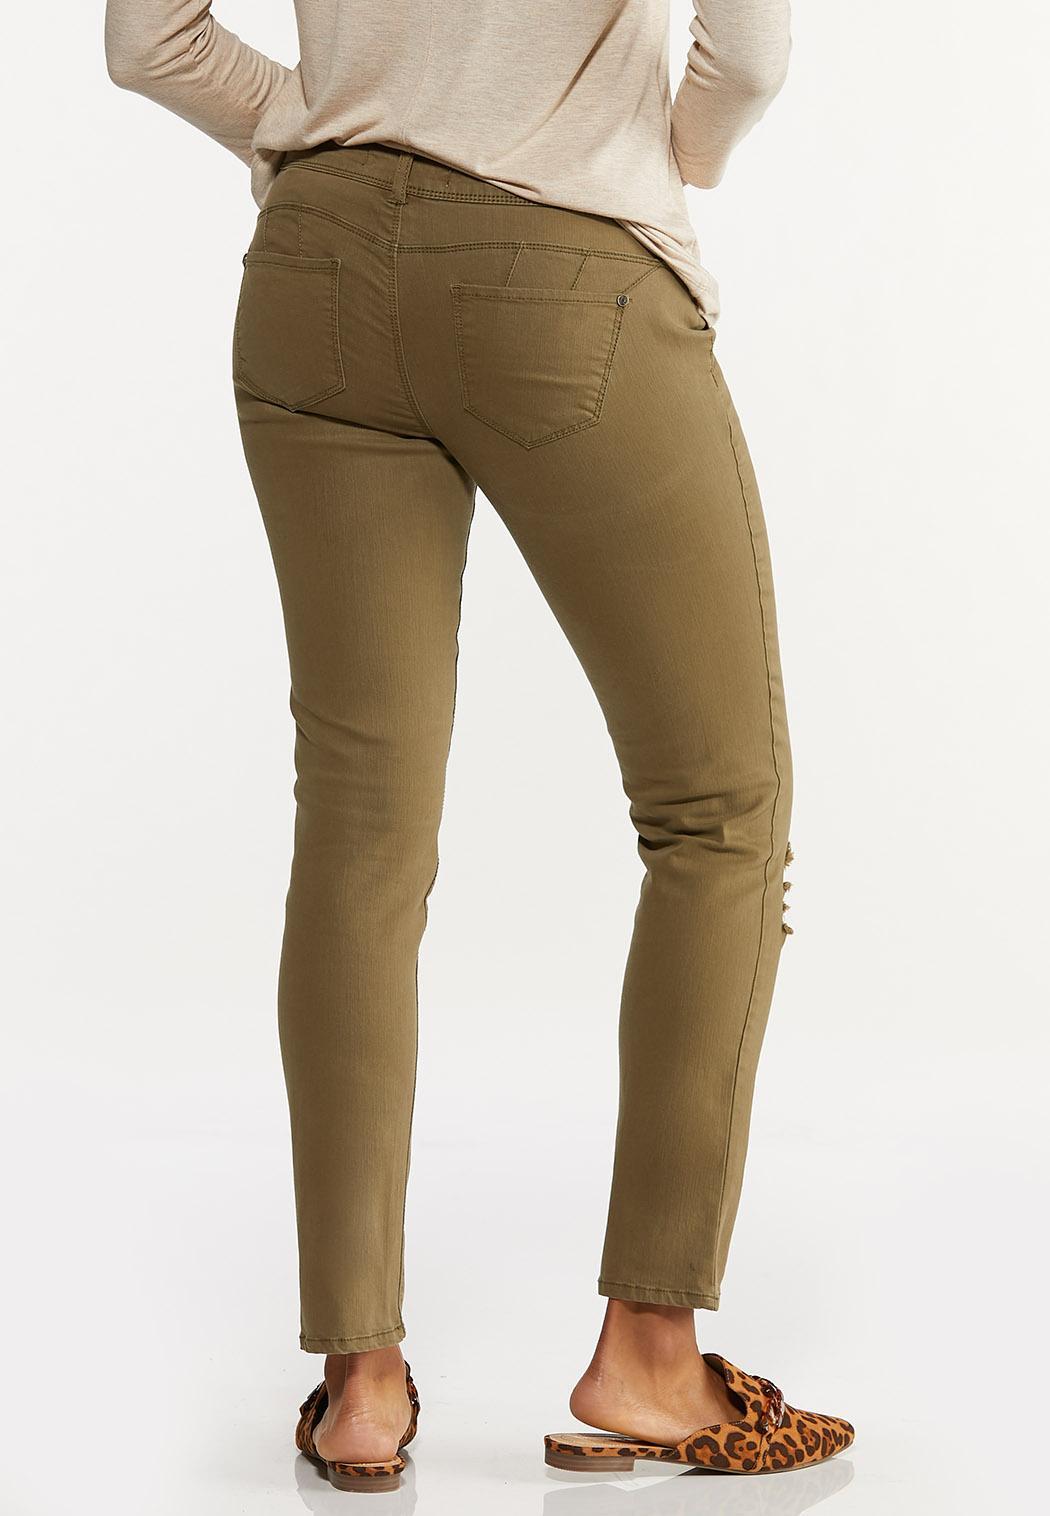 Distressed Olive Skinny Jeans (Item #44639764)